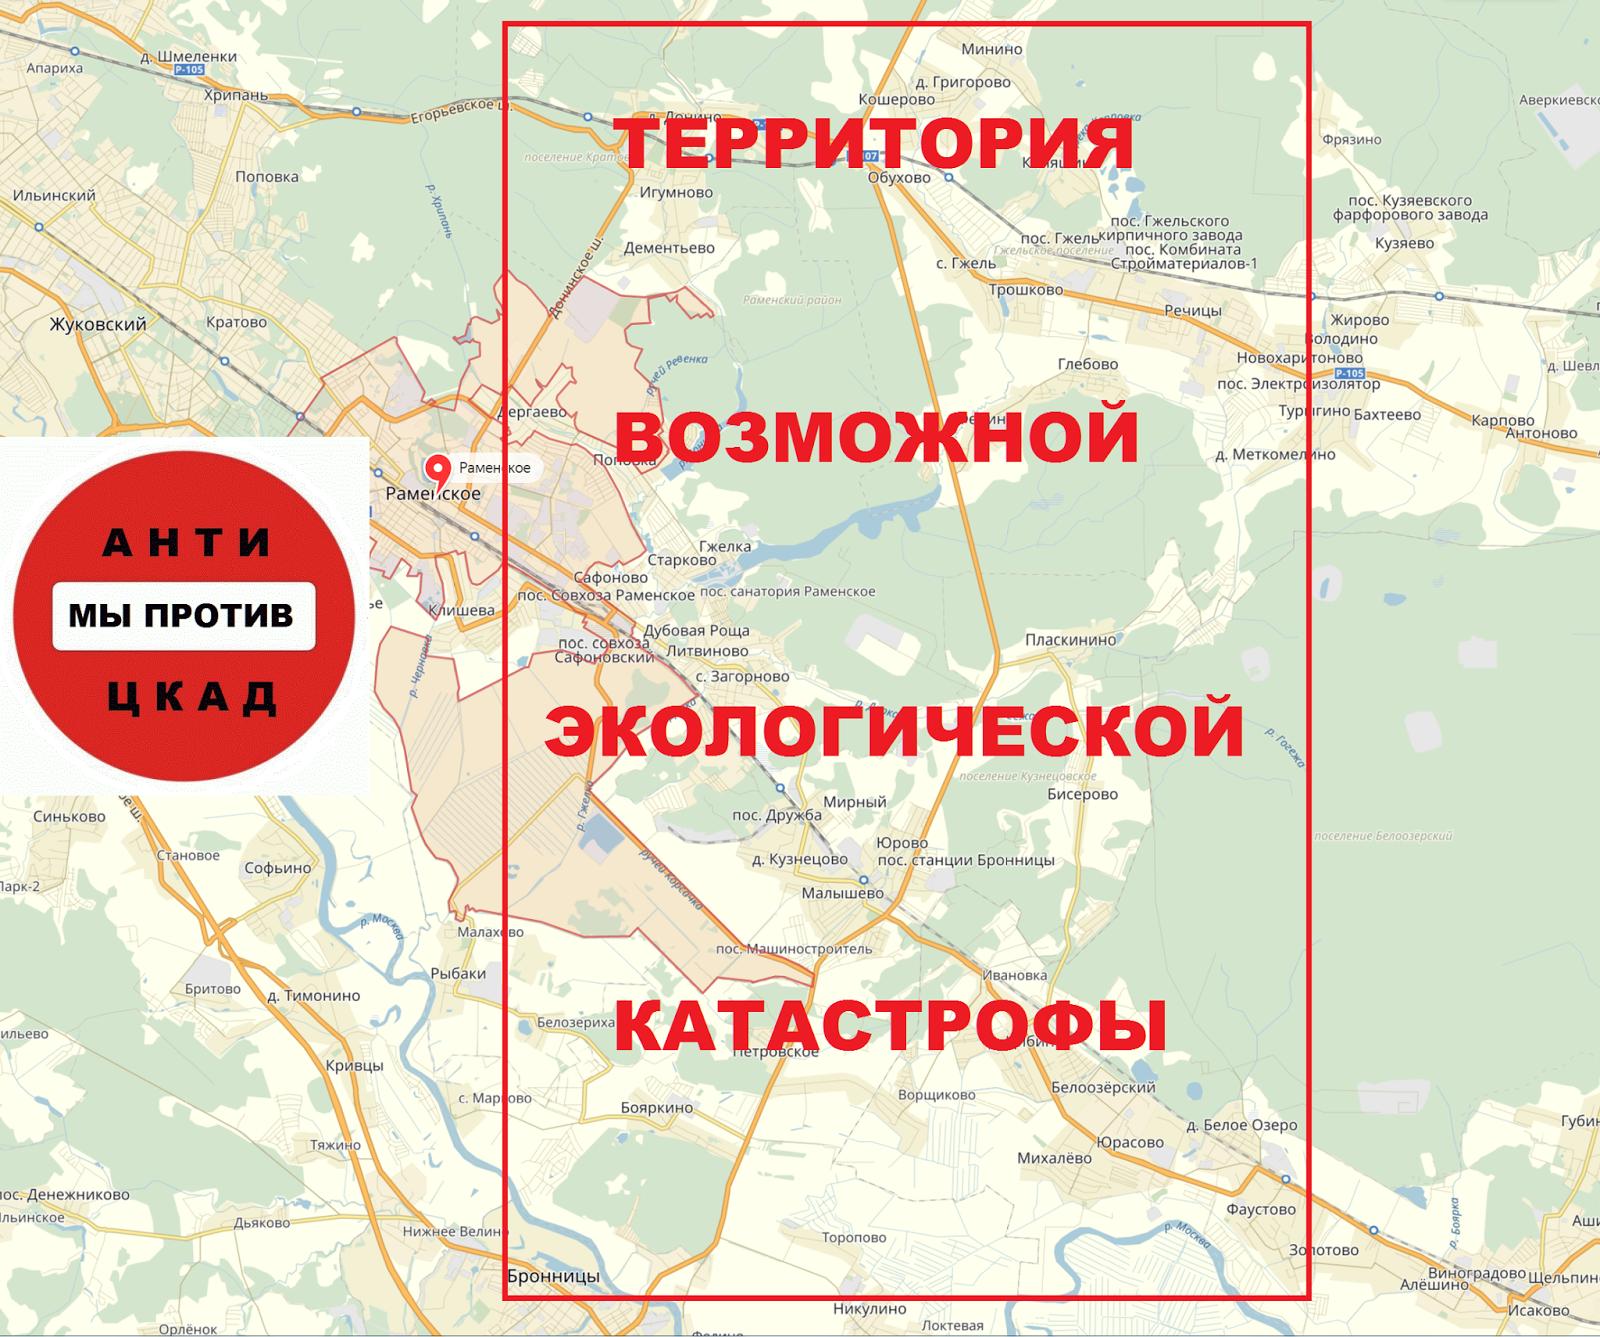 Схема цкад 2013 раменский район фото 435